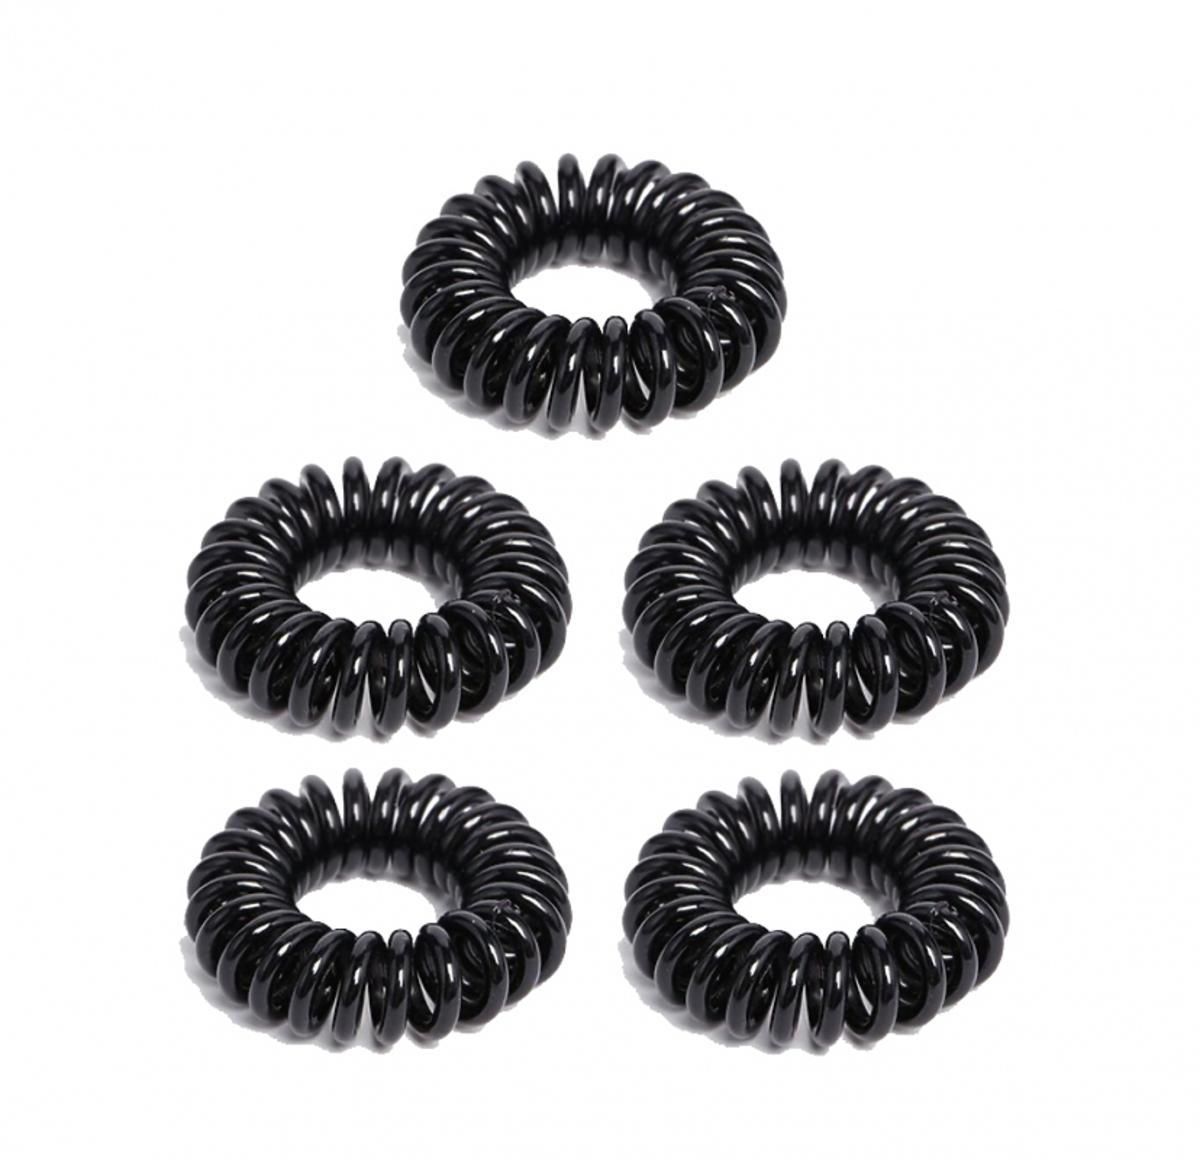 Czarne gumki spiralne